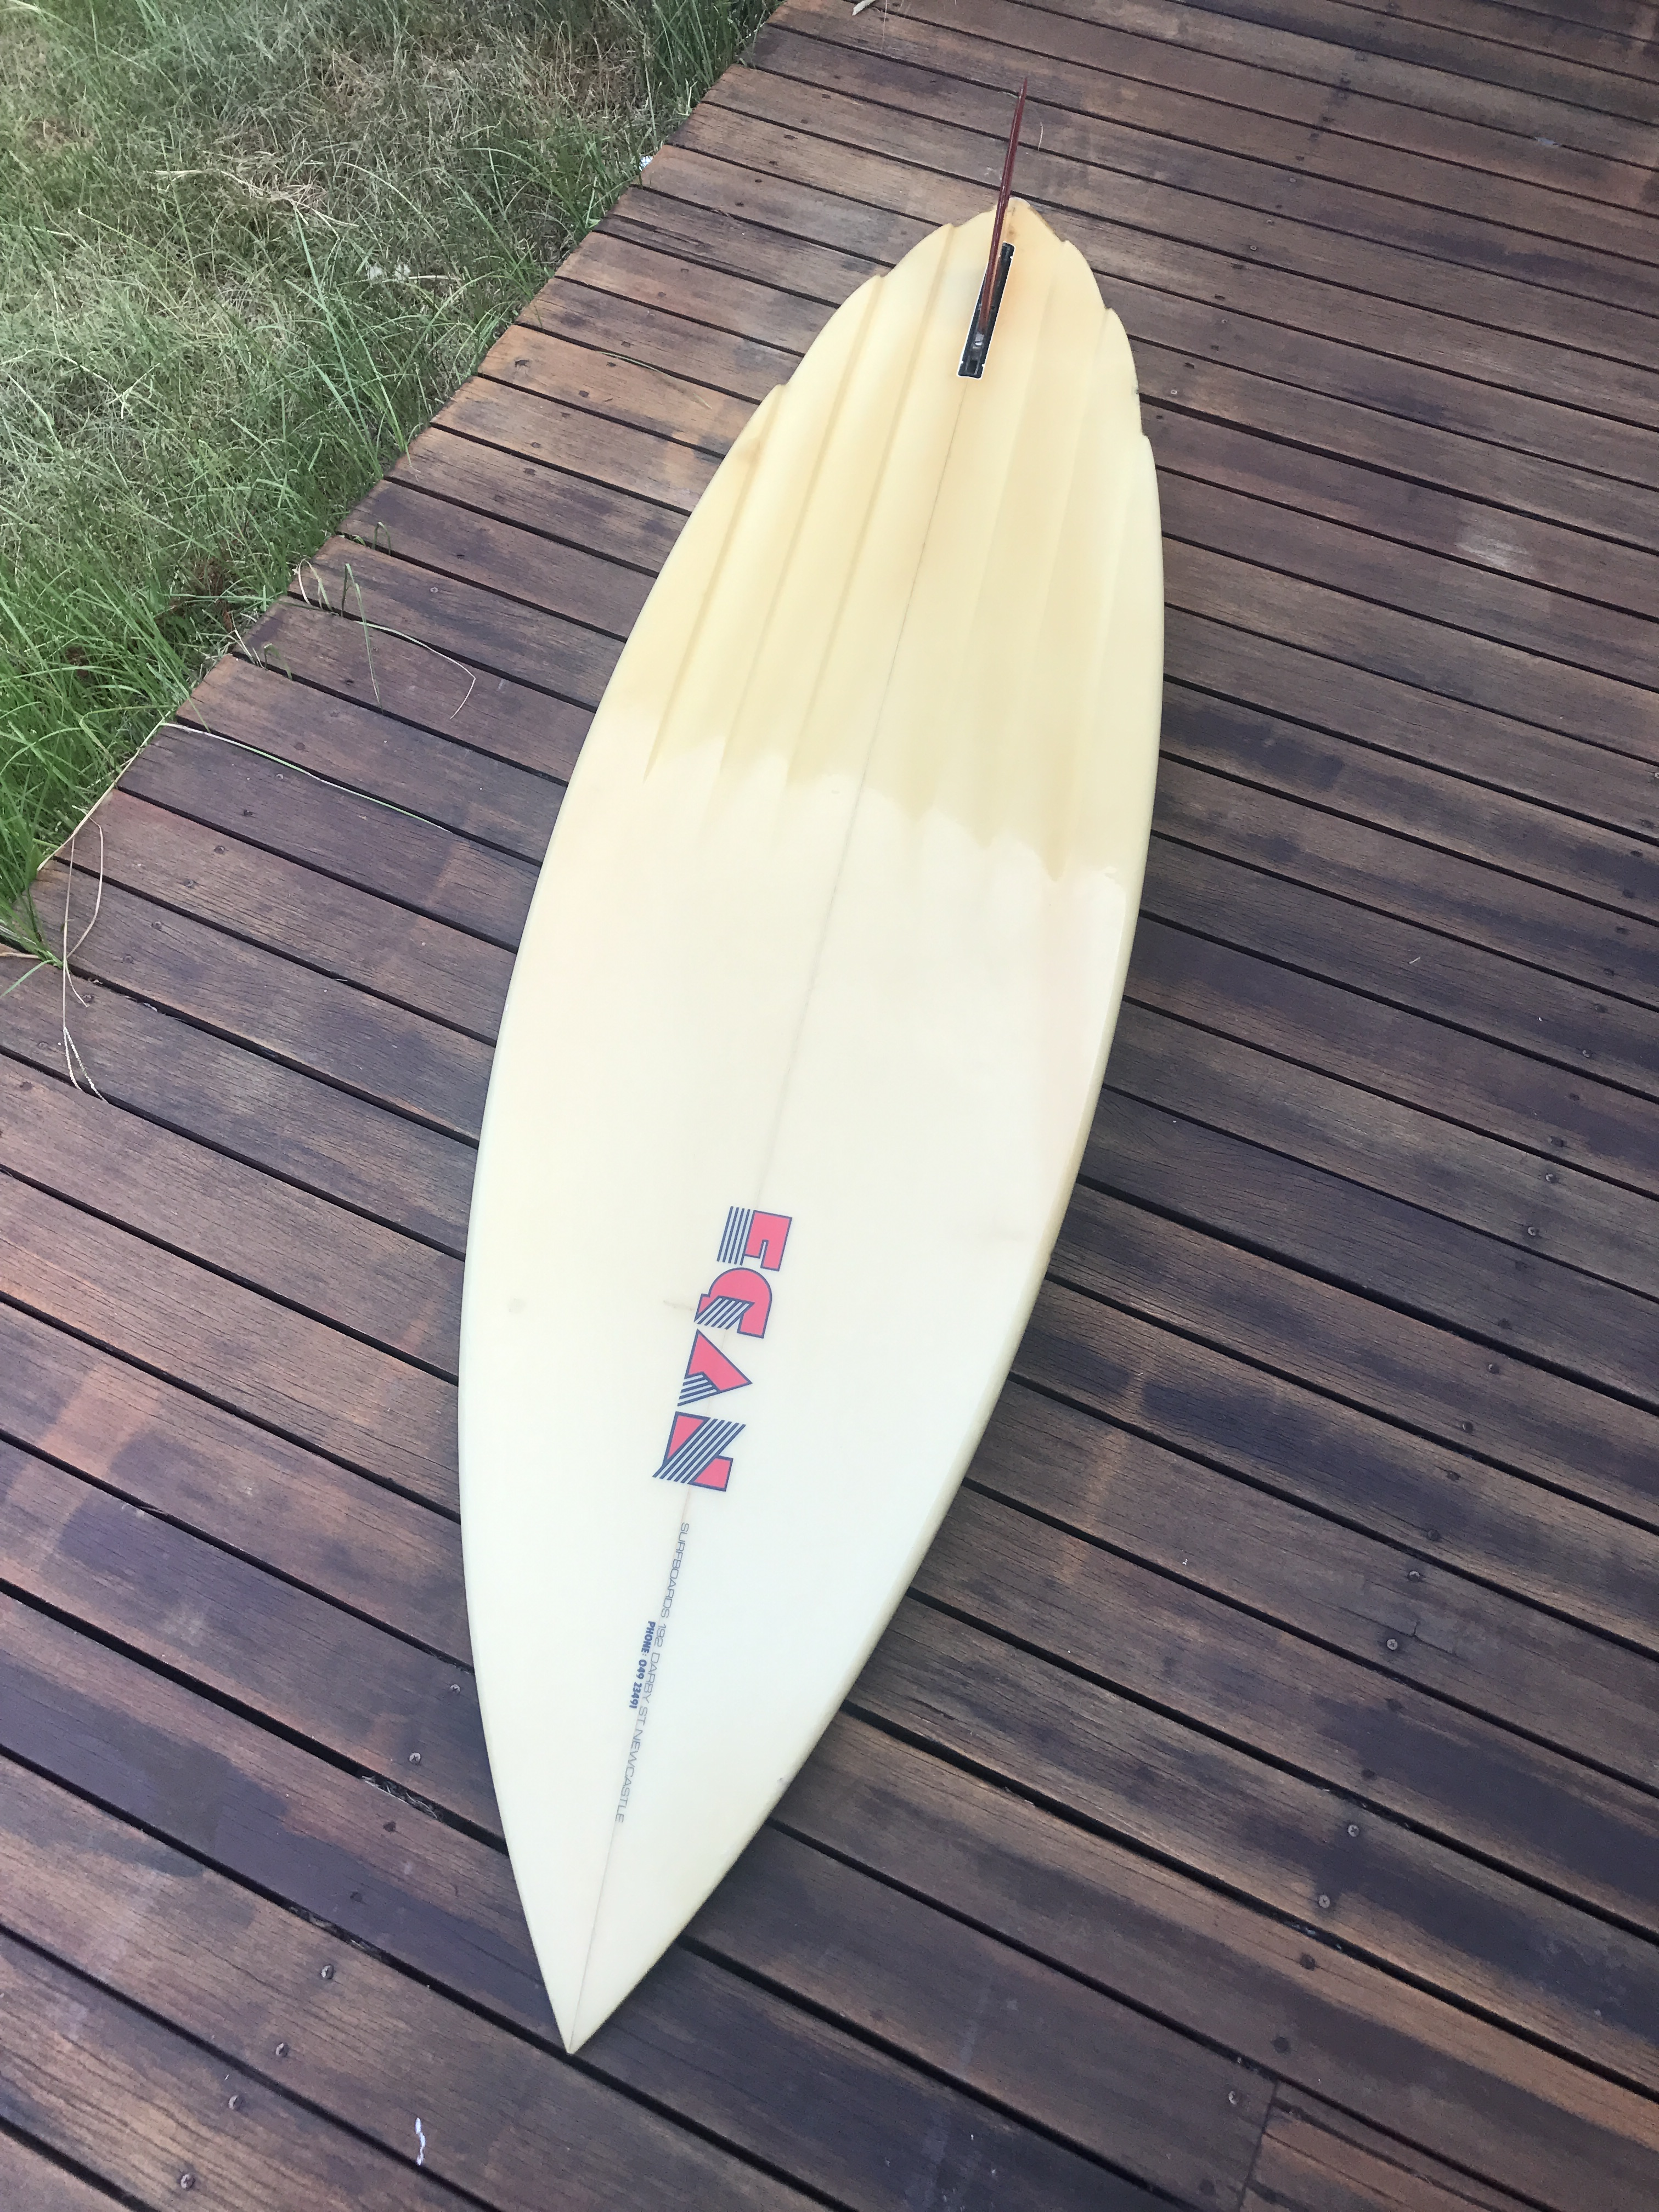 Sam-Egan-Vintage-Surfboard-2